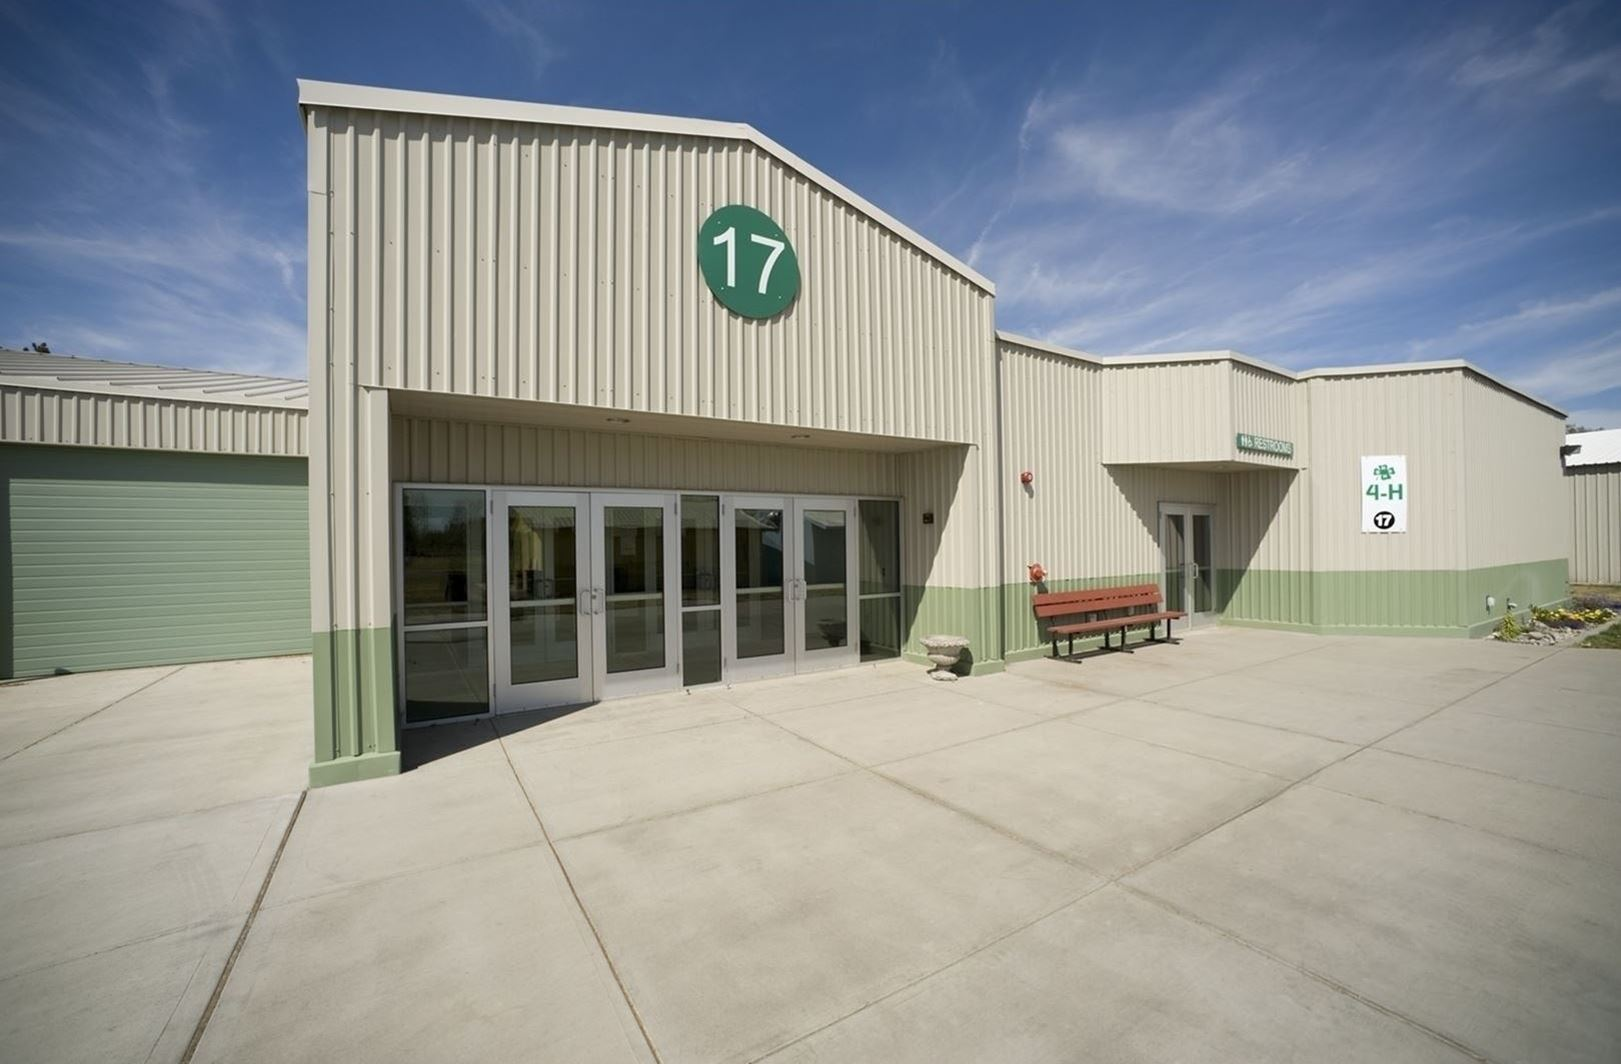 4-H Building